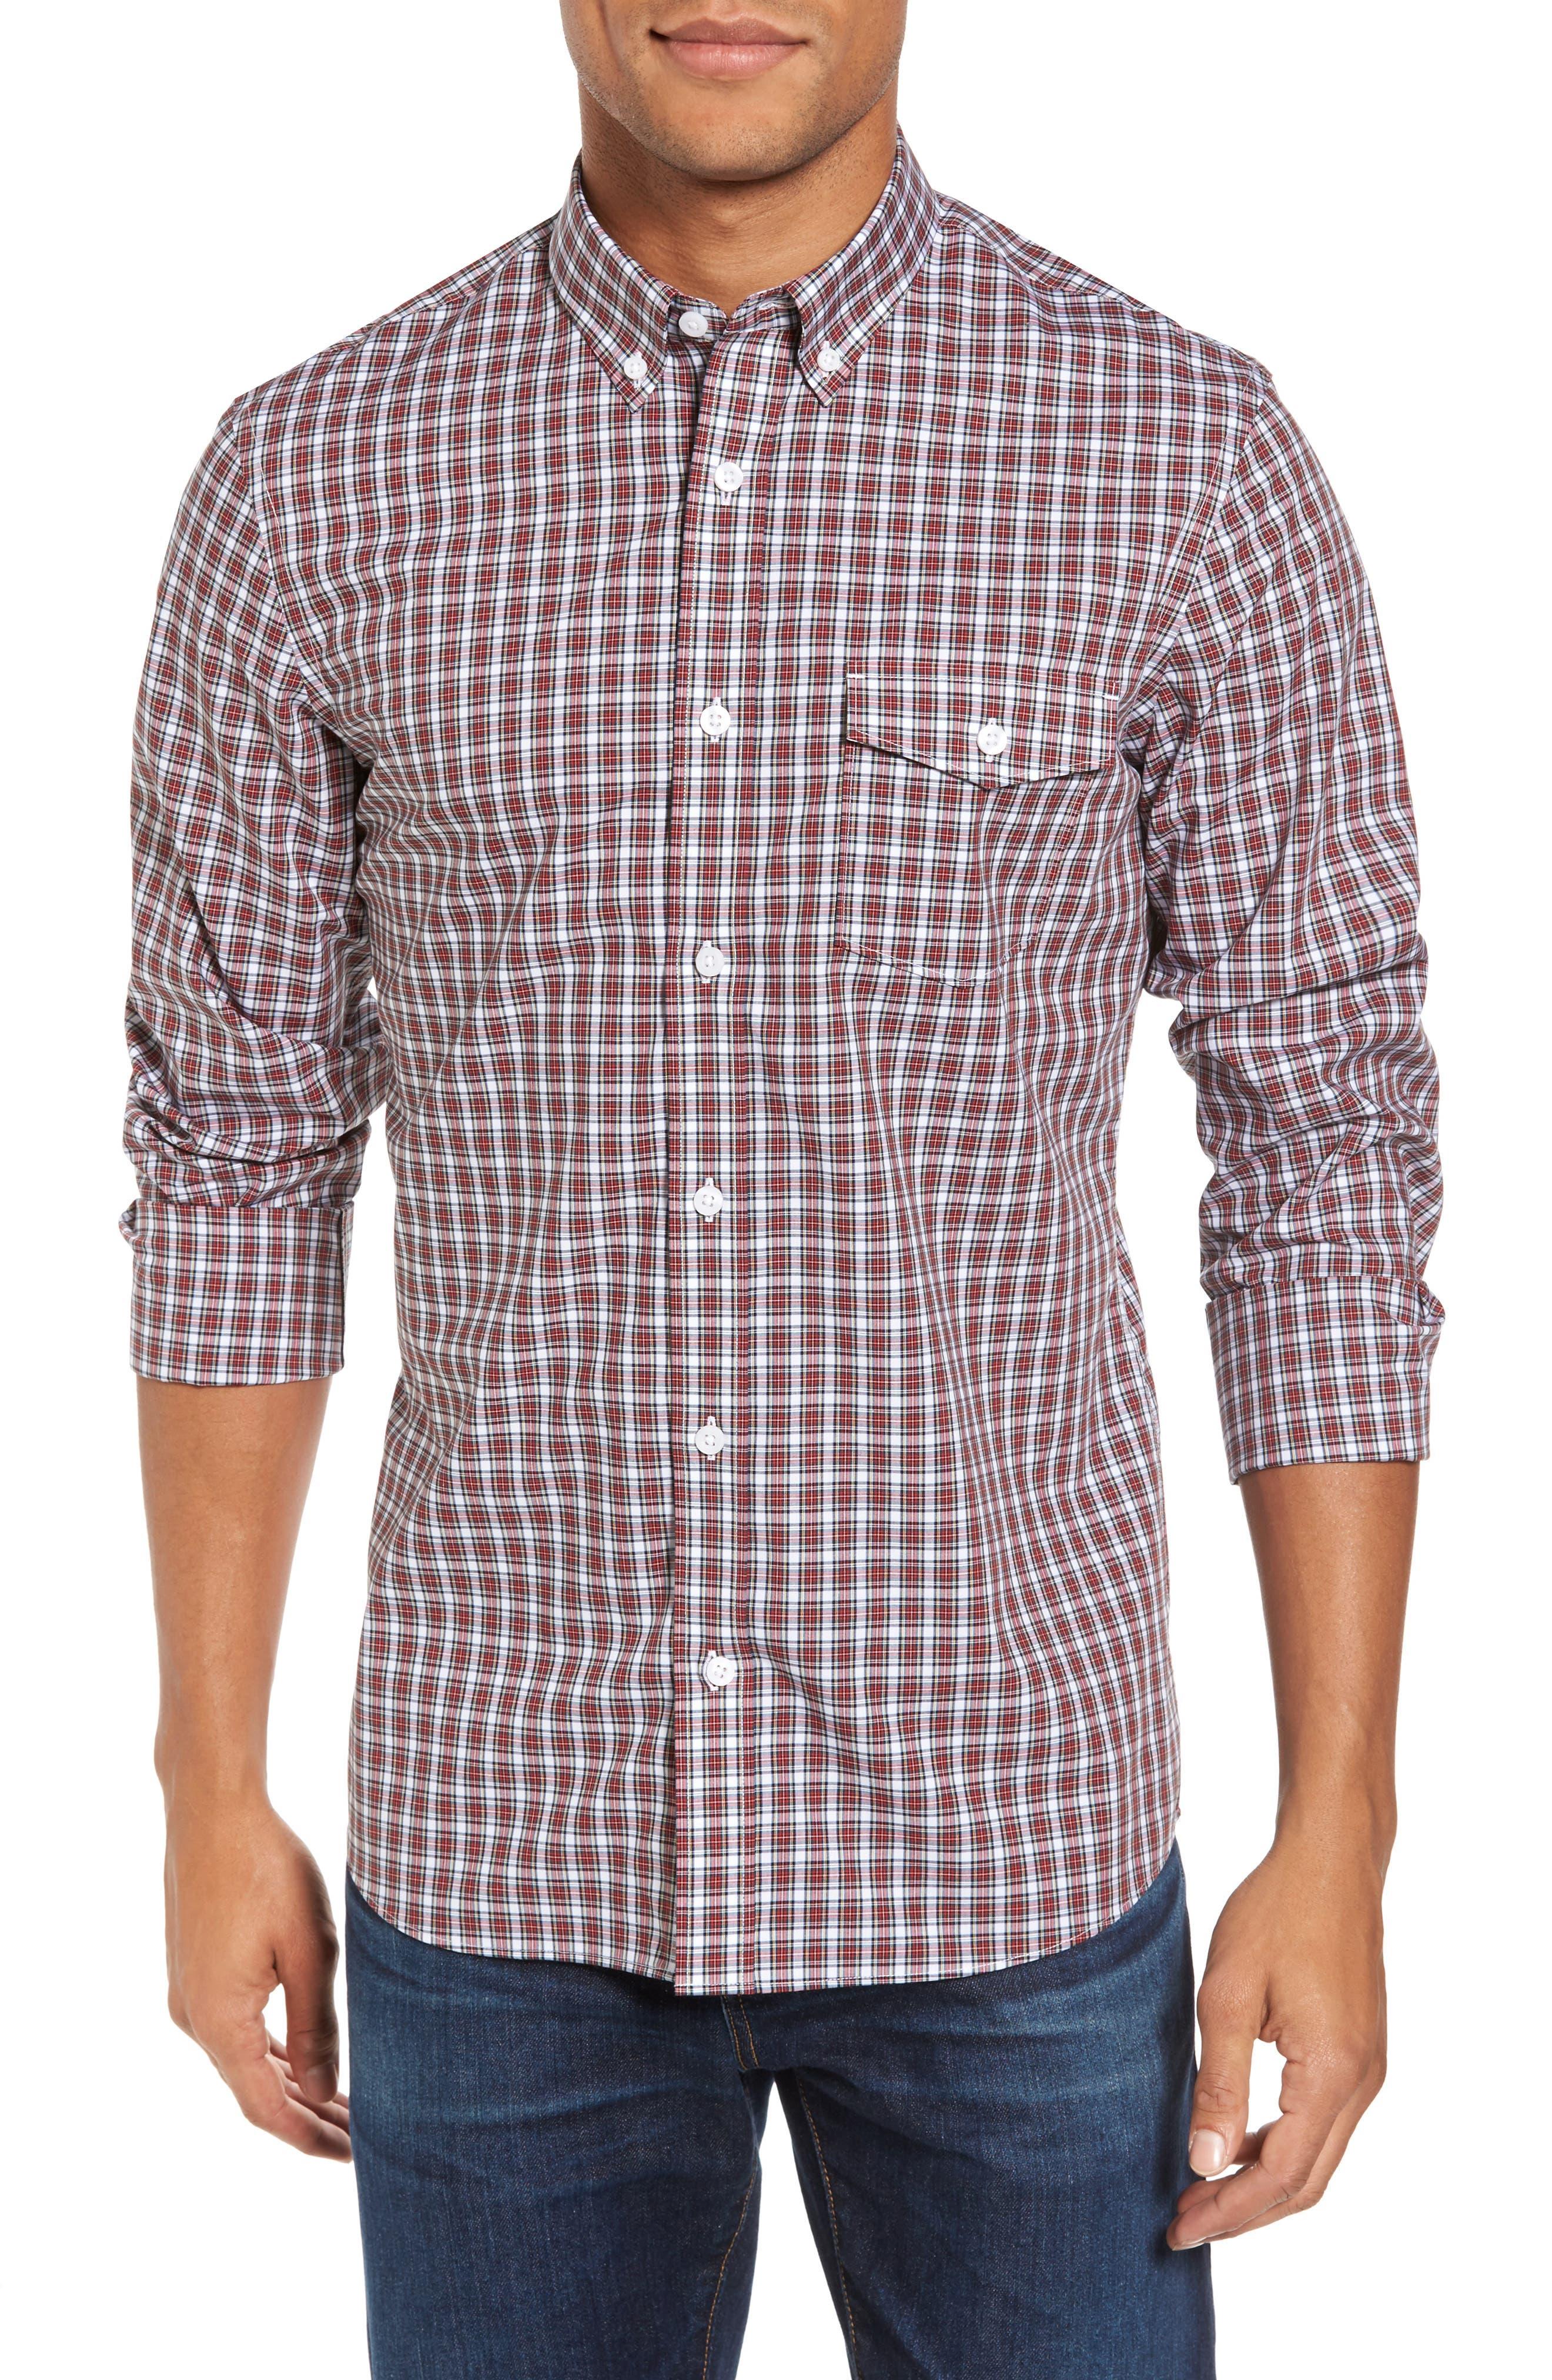 Ivy Trim Fit Non-Iron Tartan Plaid Sport Shirt,                         Main,                         color, White Red Tartan